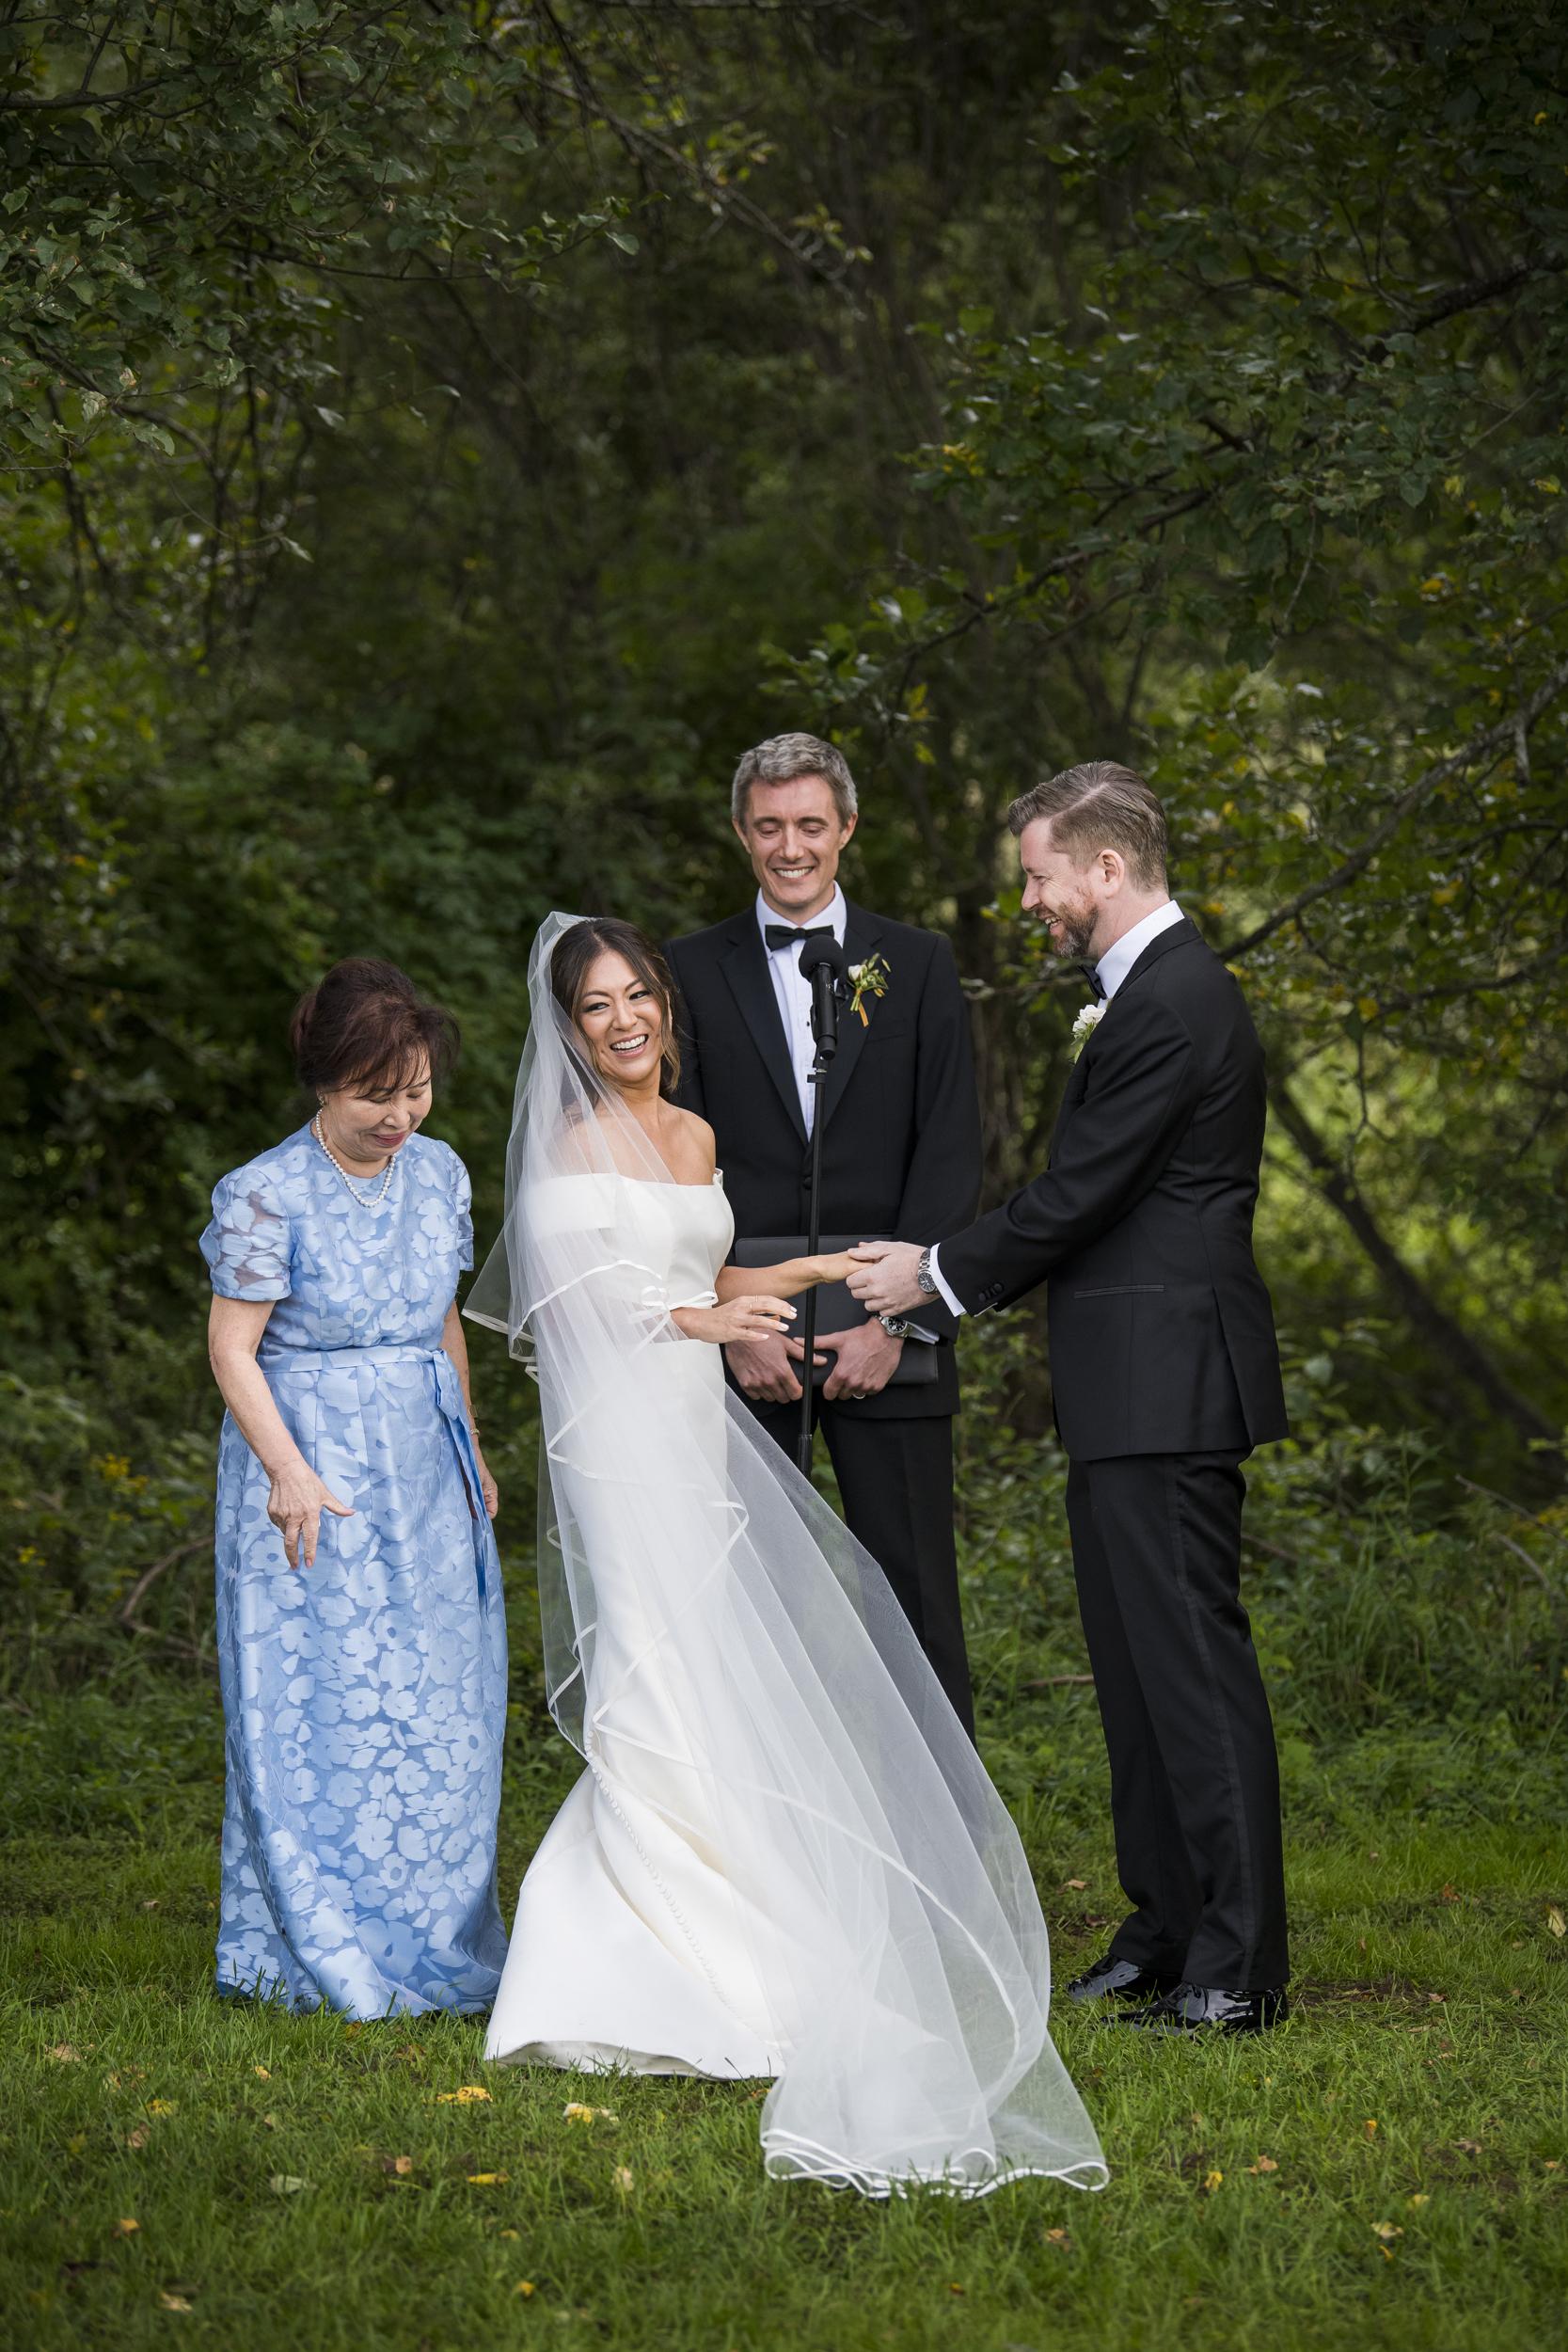 20180922_Brightsmith_CarolNick_Wedding_06967.jpg